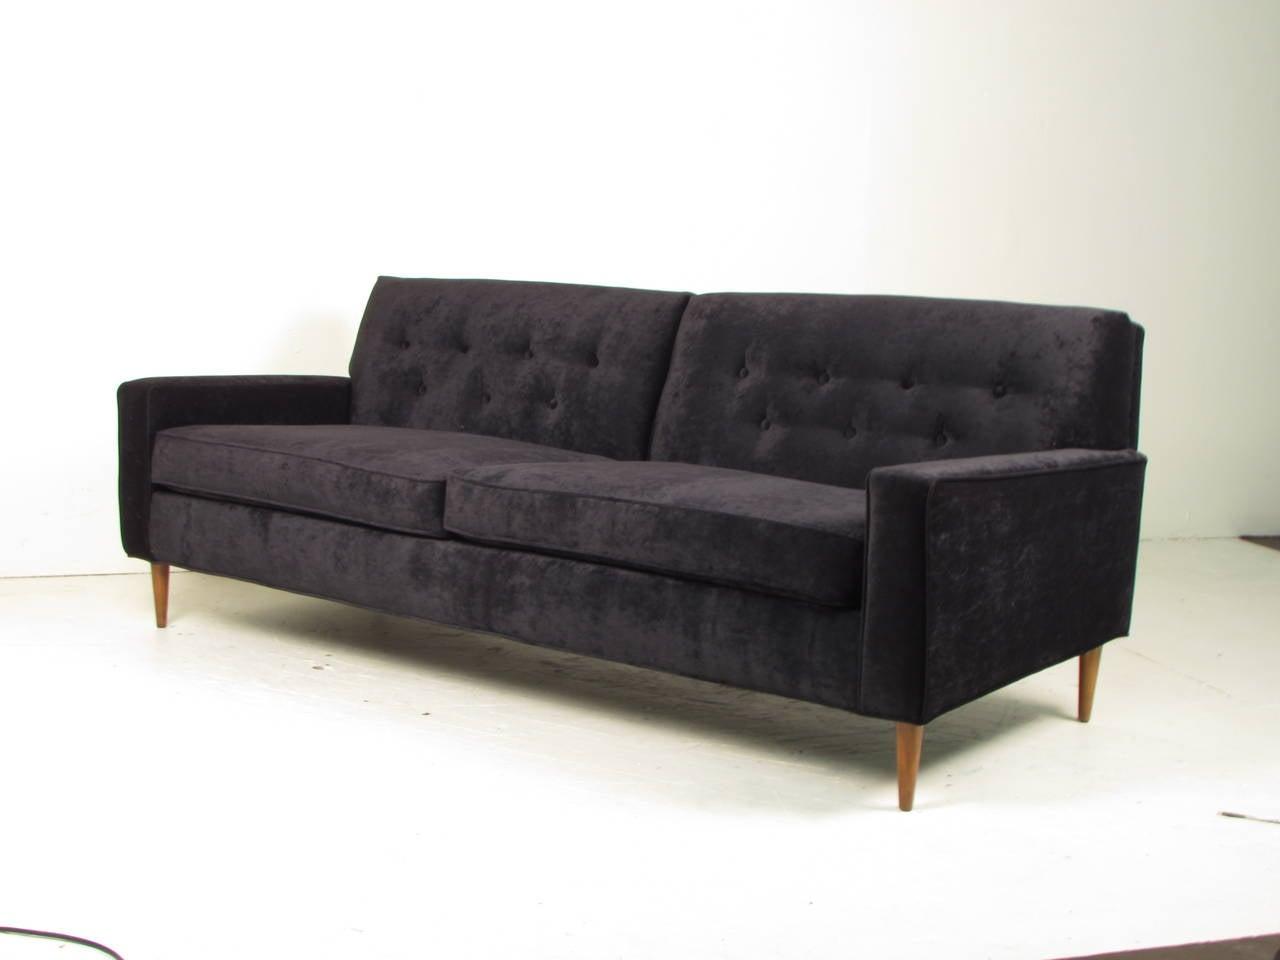 Seductive Black Velvet Sofa In The Style Of Milo Baughman At 1stdibs